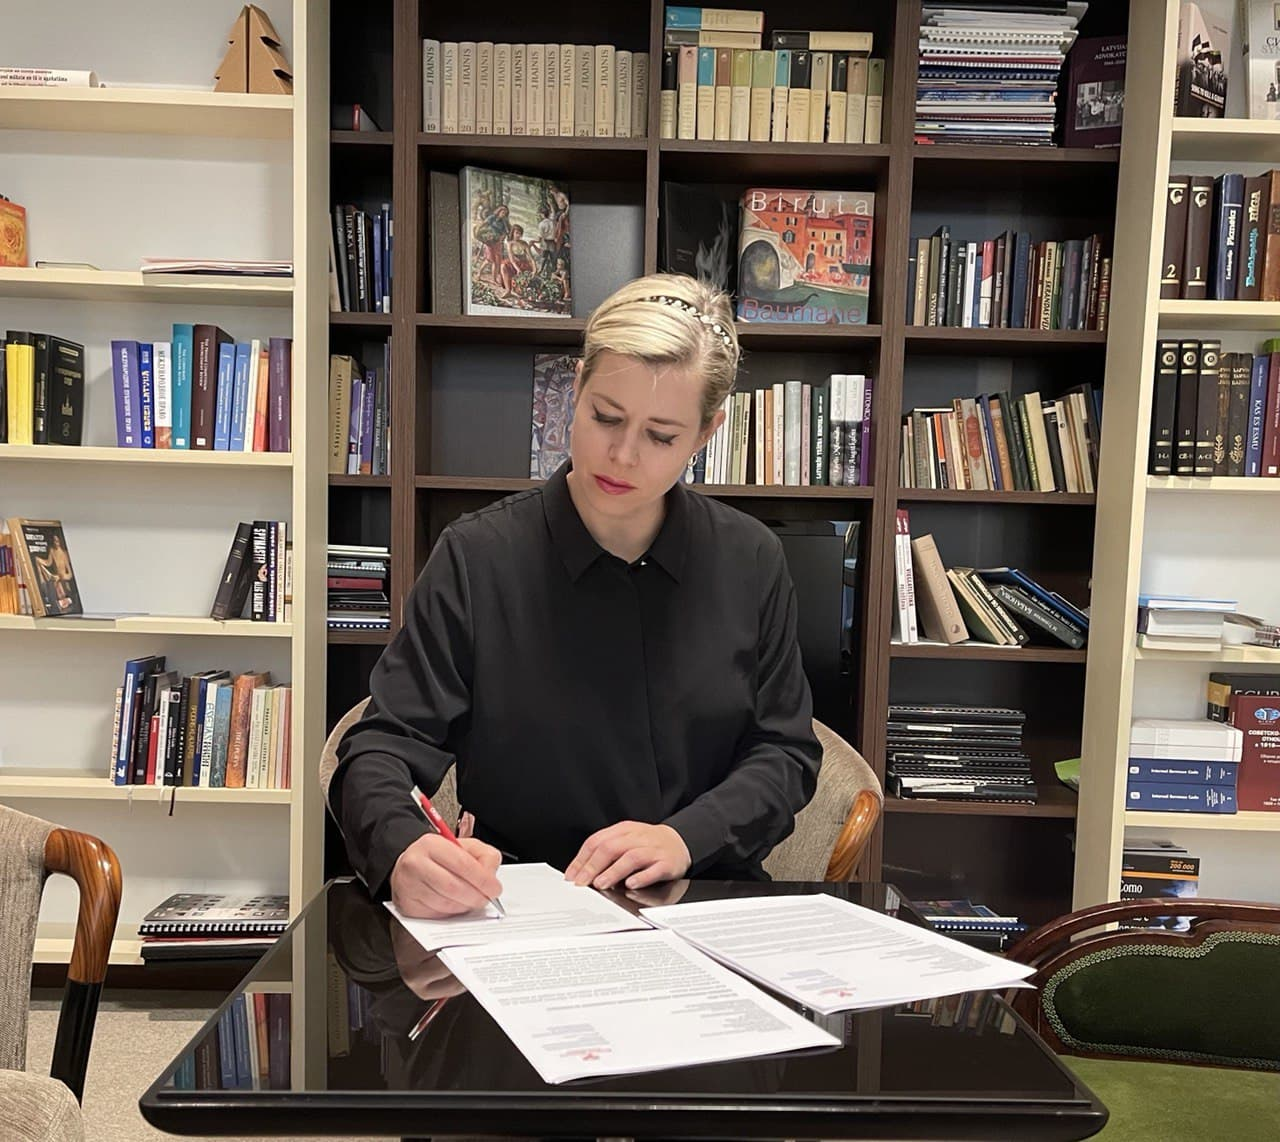 Belarus Women's Foundation Sends an Open Letter to UK Prime Minister